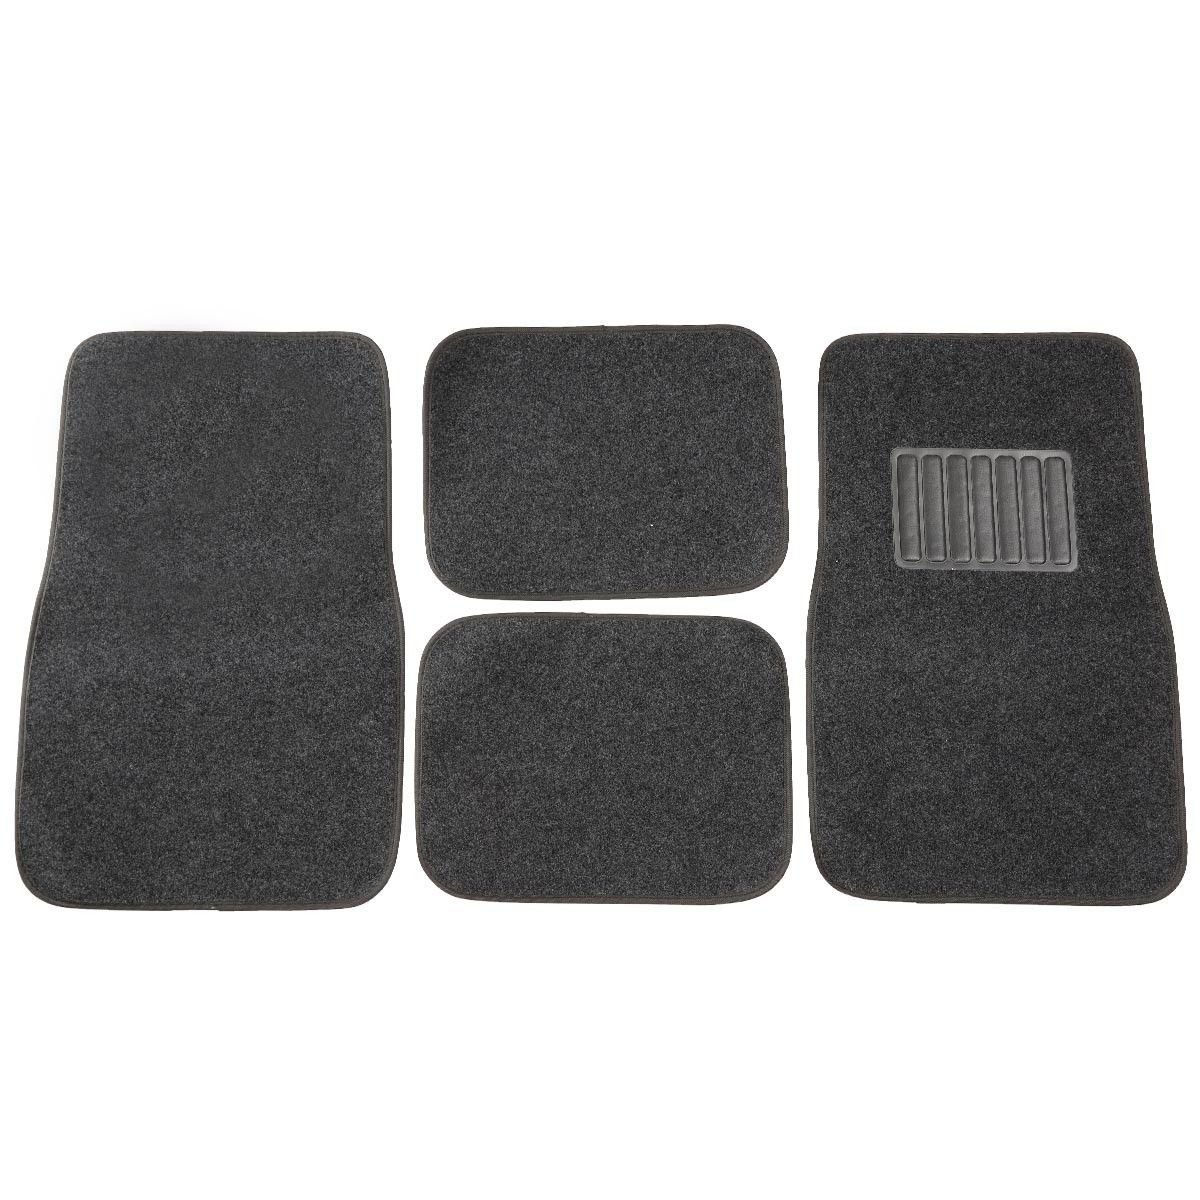 New Universal 4 PC Solid Car Floor Carpet Mat Pad Truck SUV VAN Mats Dark Gray